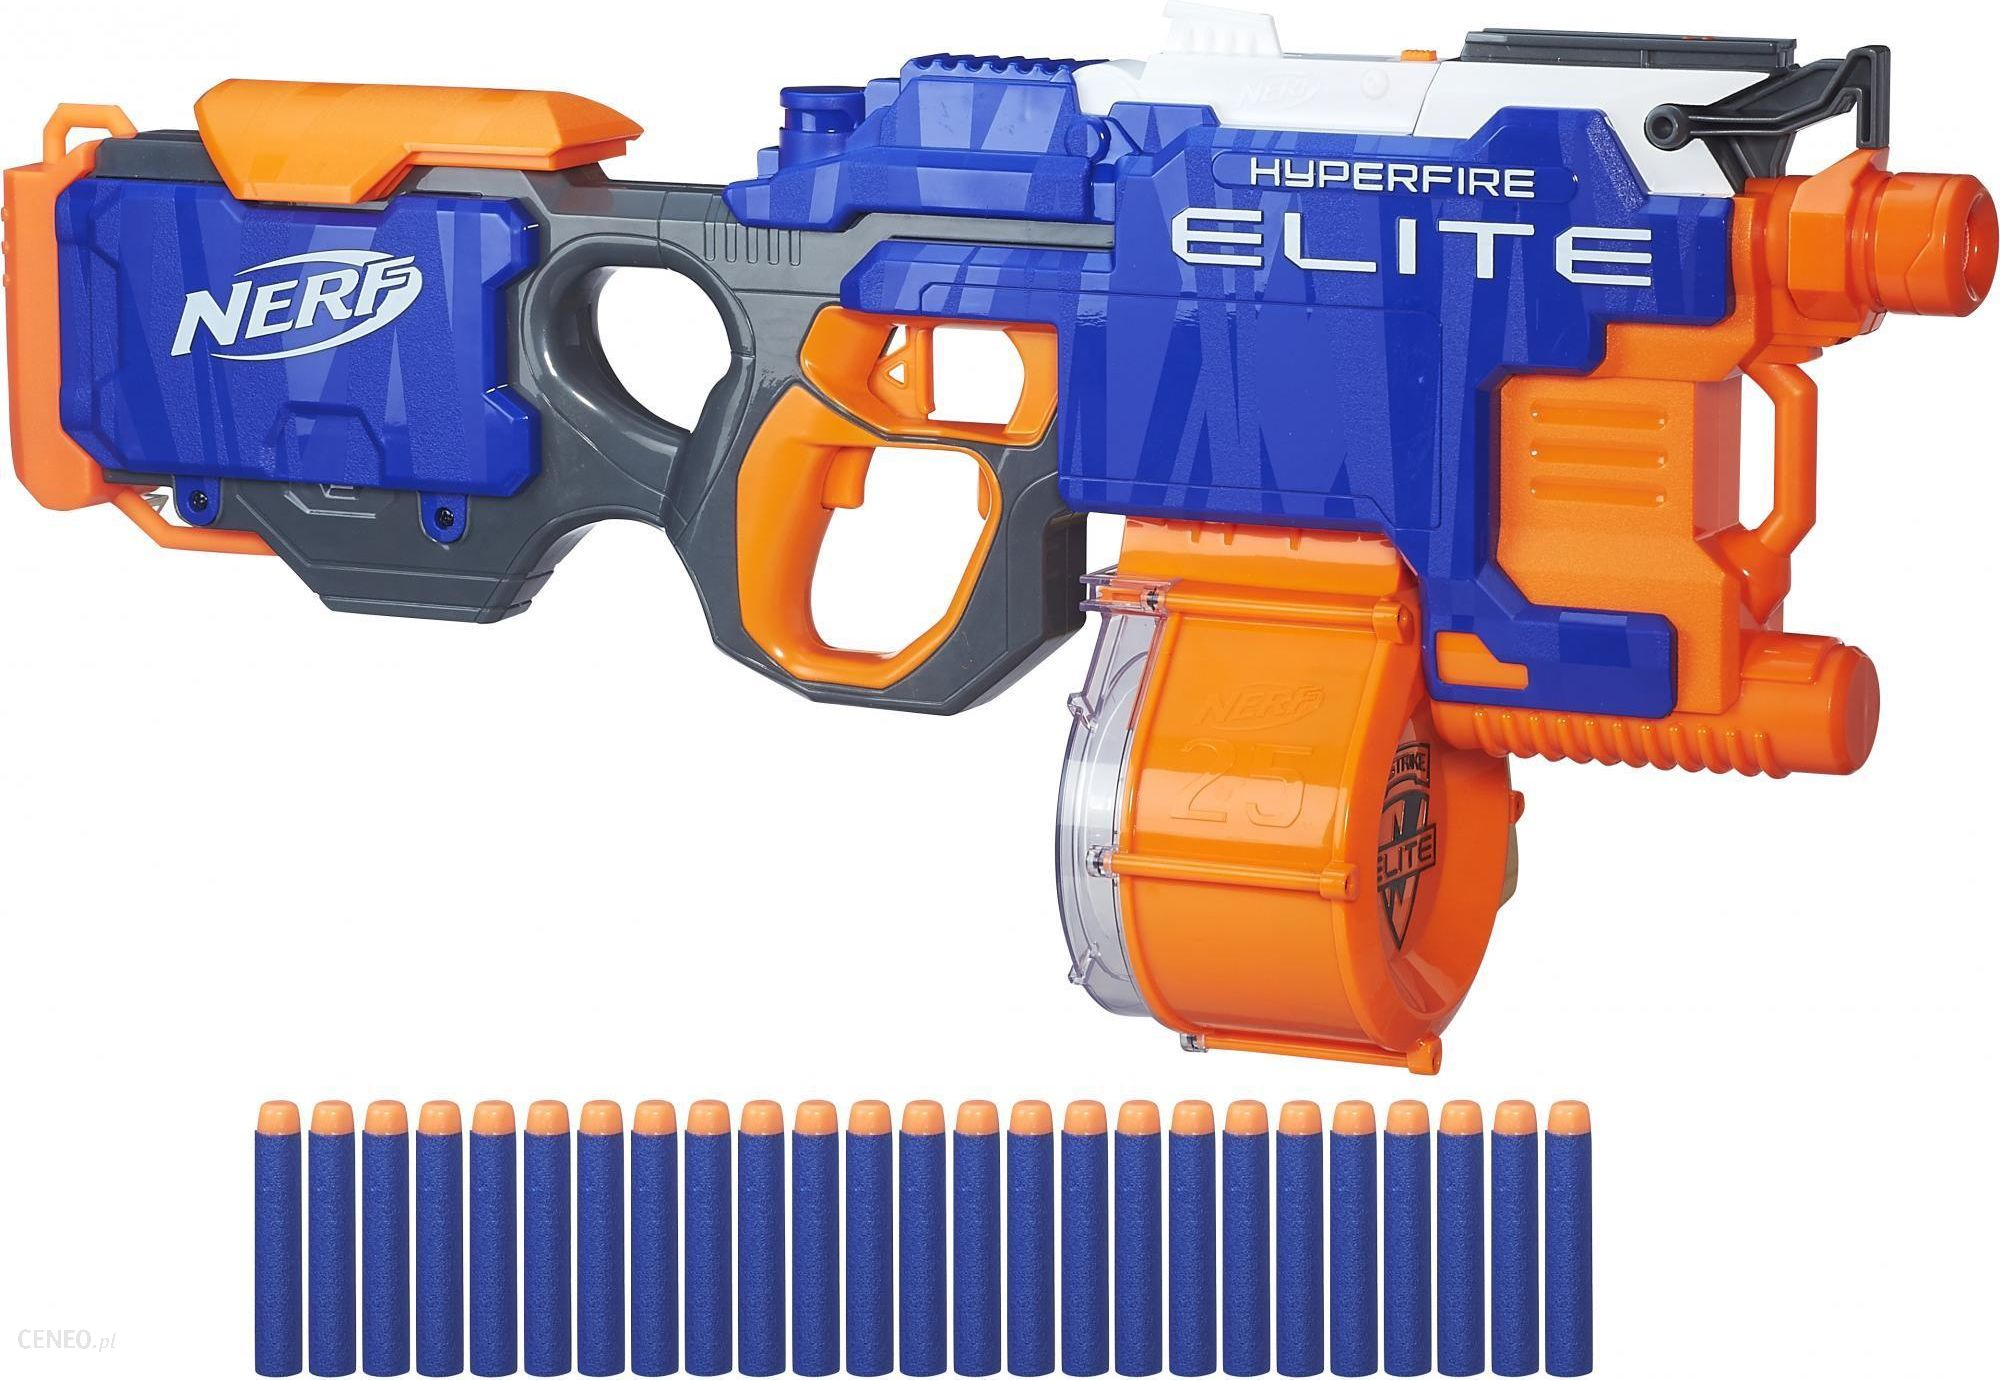 Hasbro Nerf N Strike Elite Hyperfire B5573 Opinie Komentarze O Produkcie 3